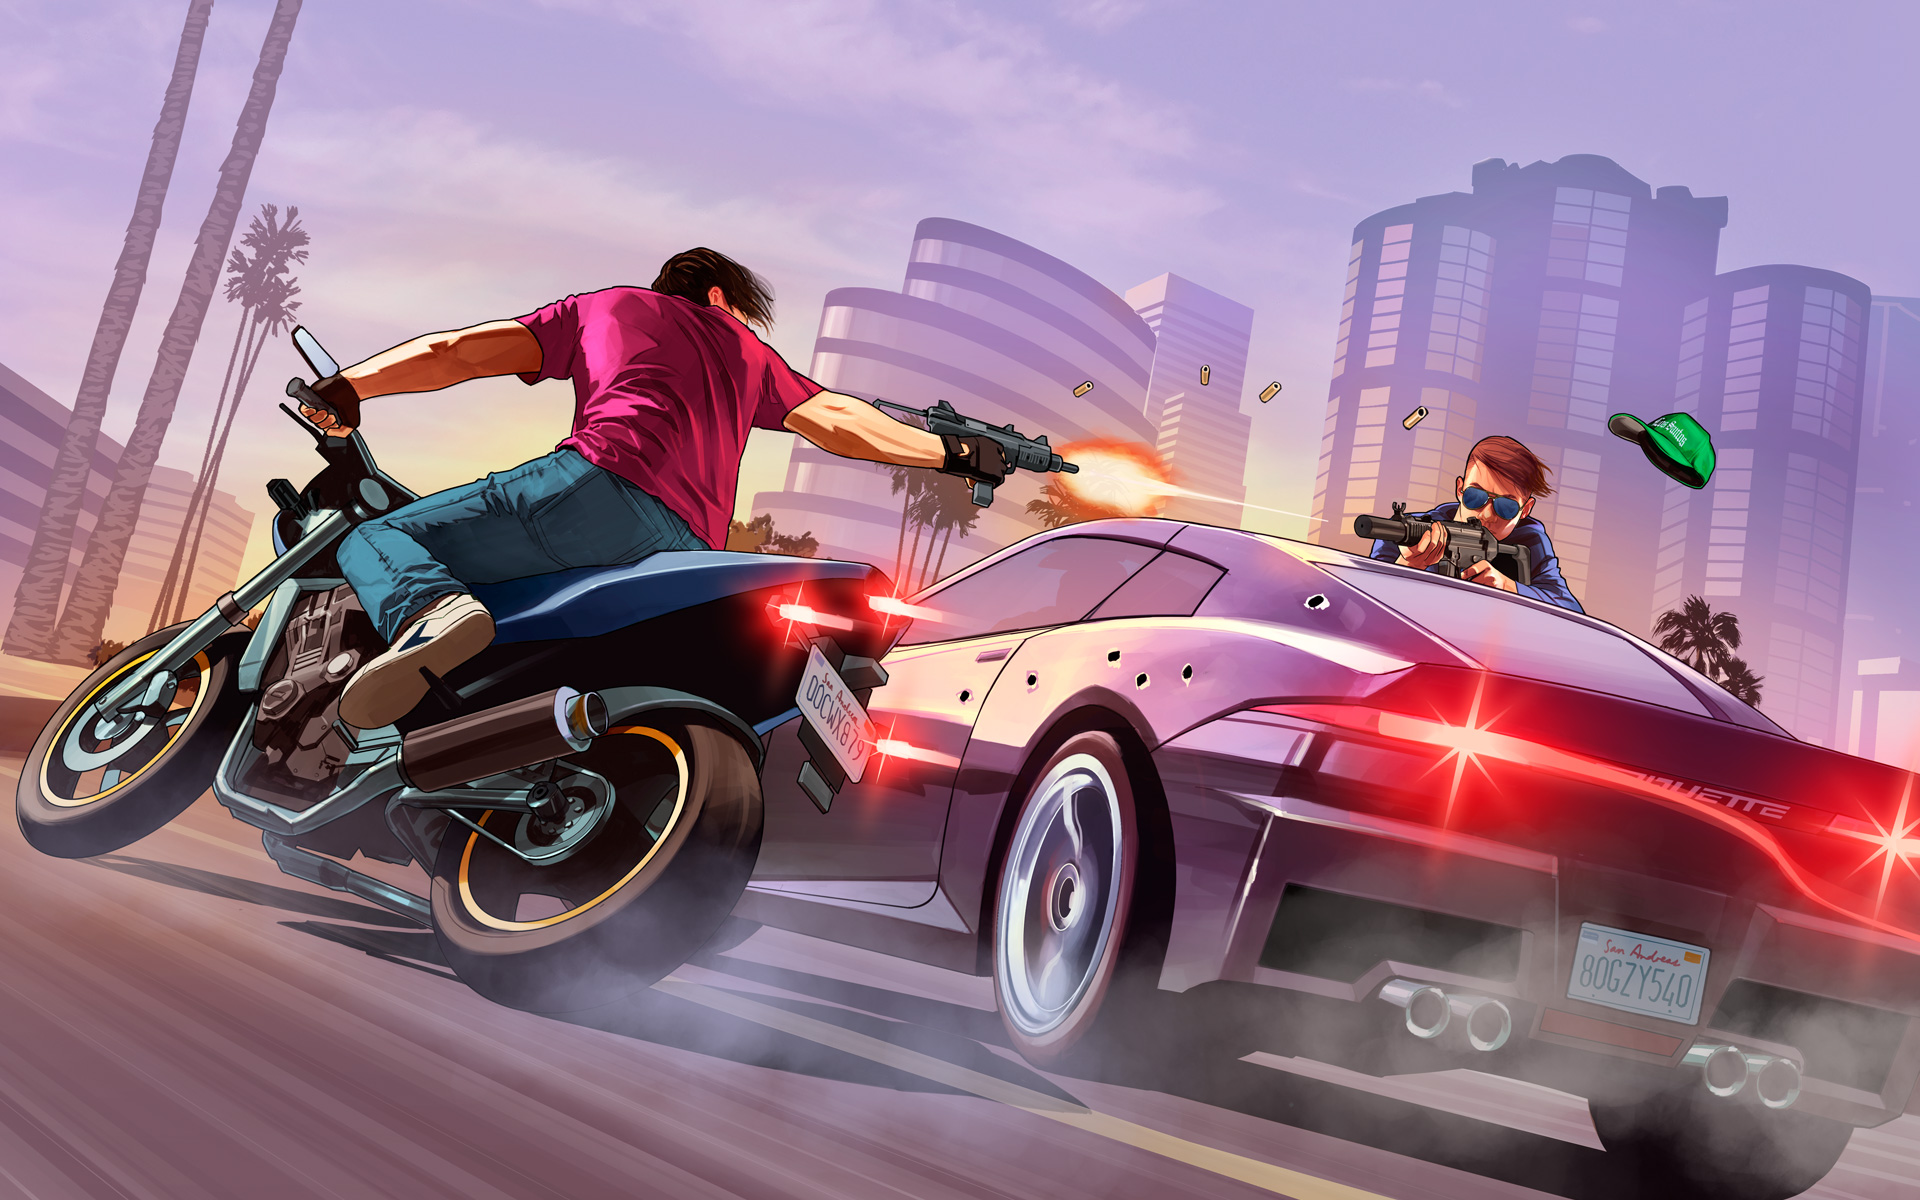 HD Wallpapers GTA 5 Street Fight